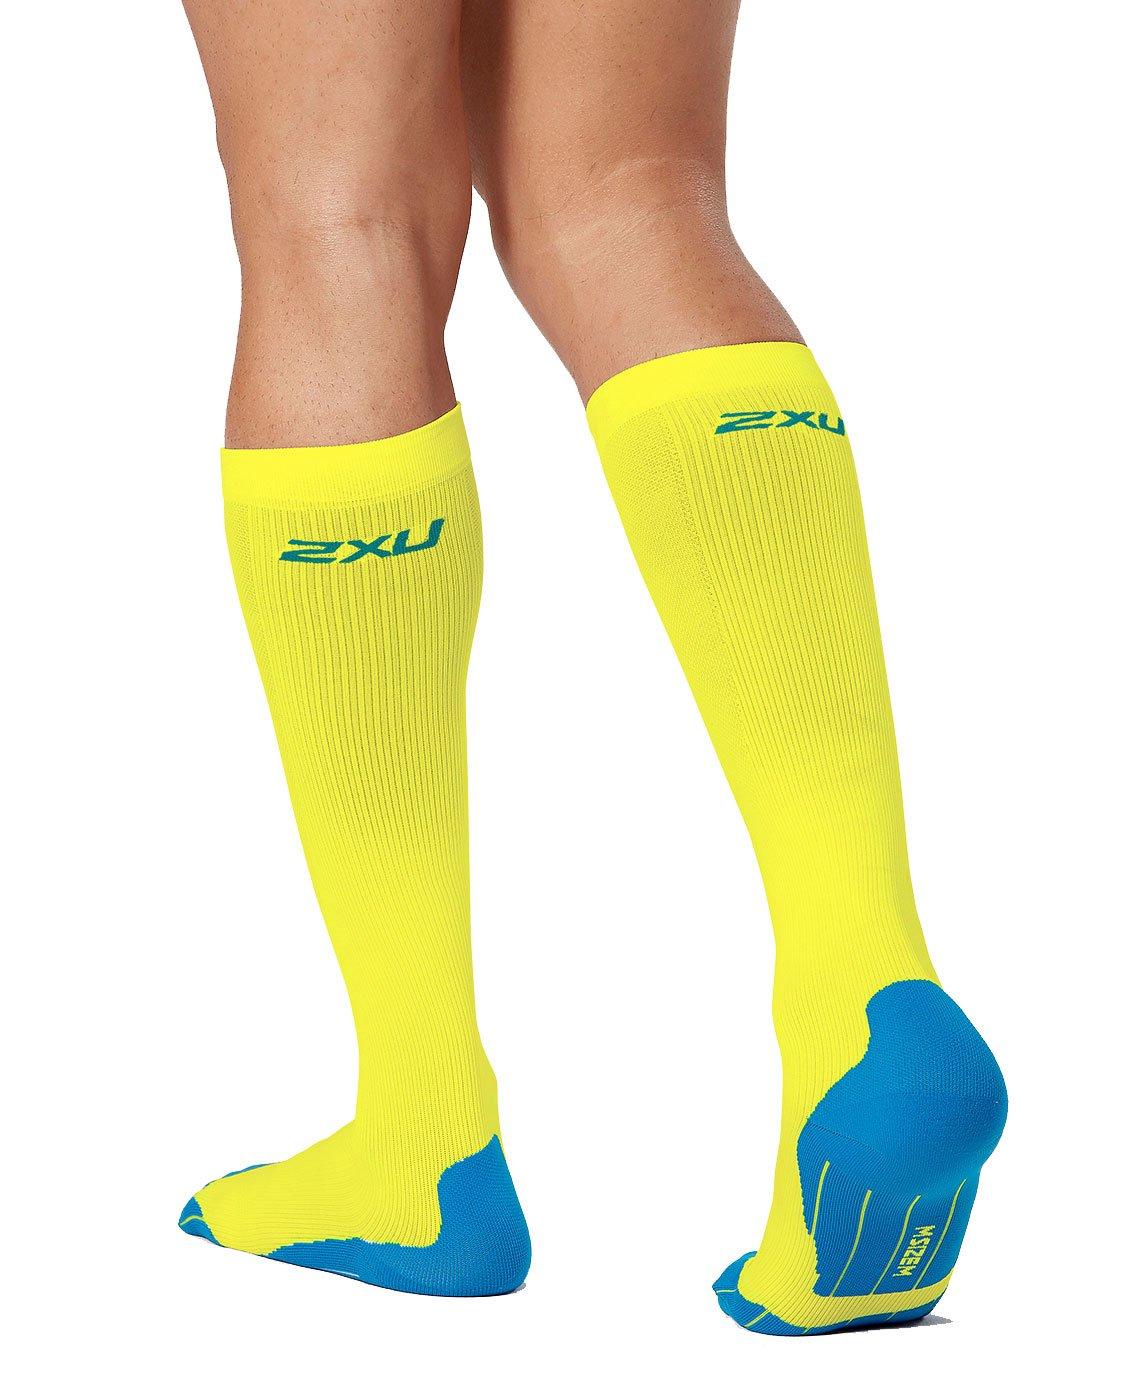 2XU Men's Compression Performance Run Socks, Fluro Yellow/Vibrant Blue, X-Small by 2XU (Image #2)